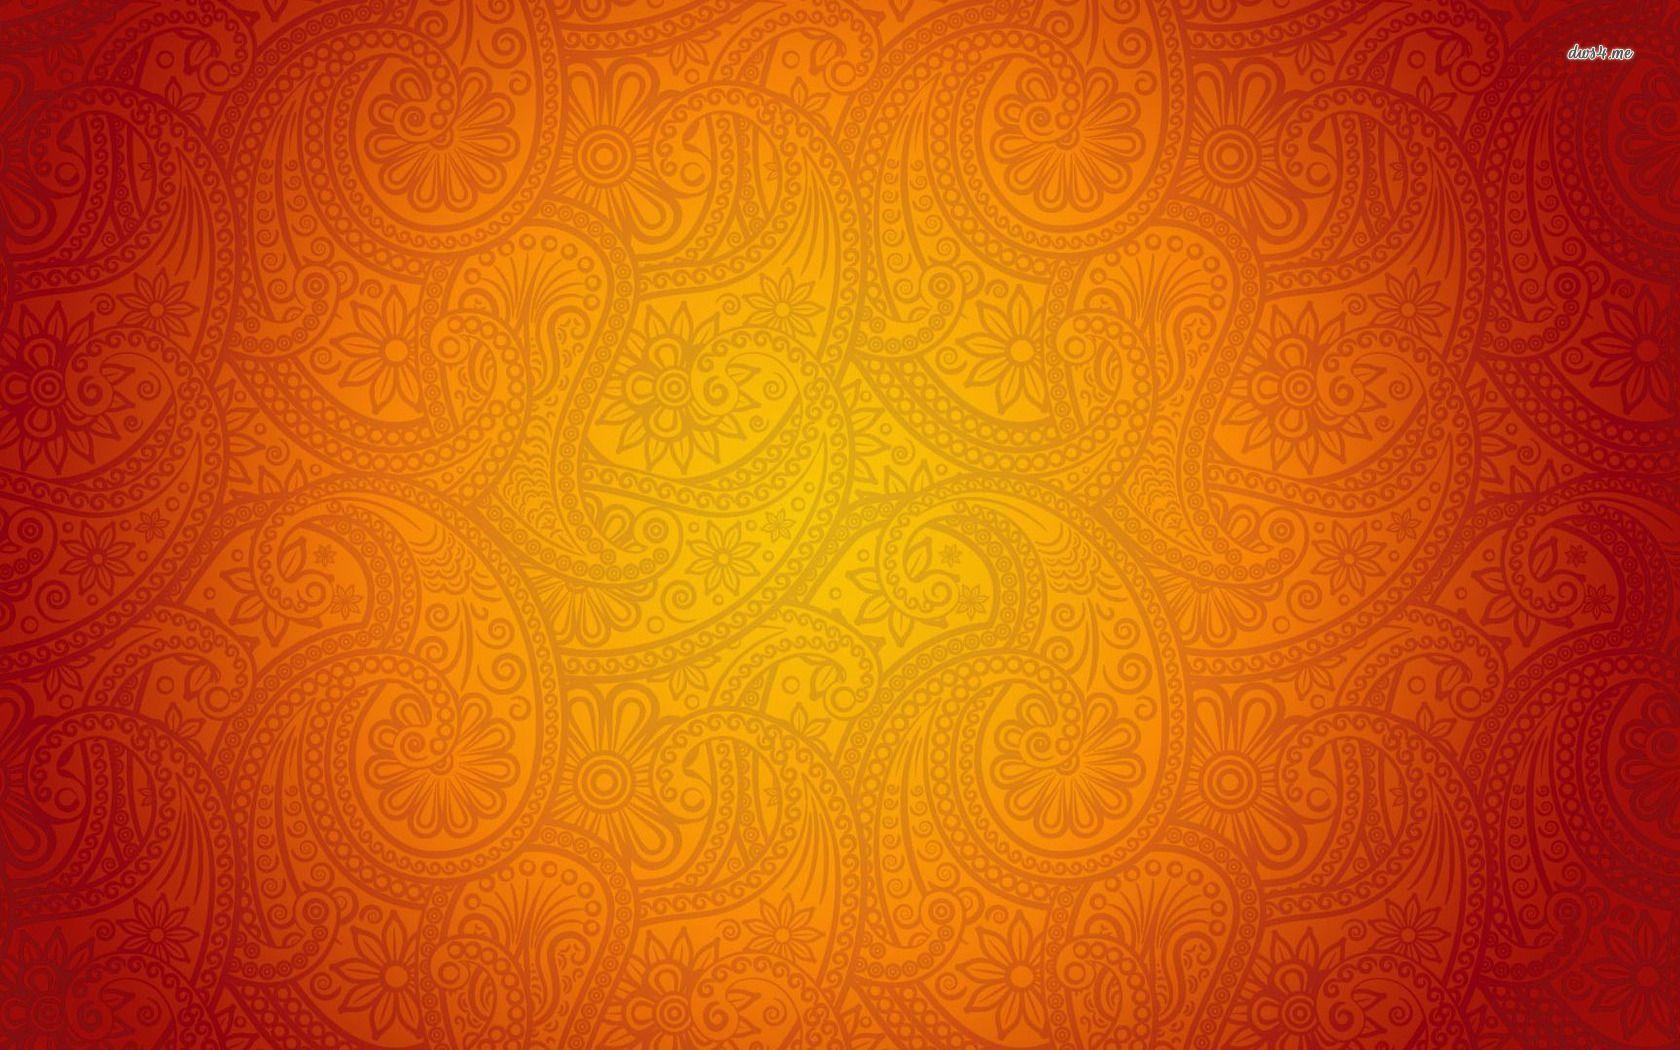 Unduh 57 Background Orange Light HD Terbaru